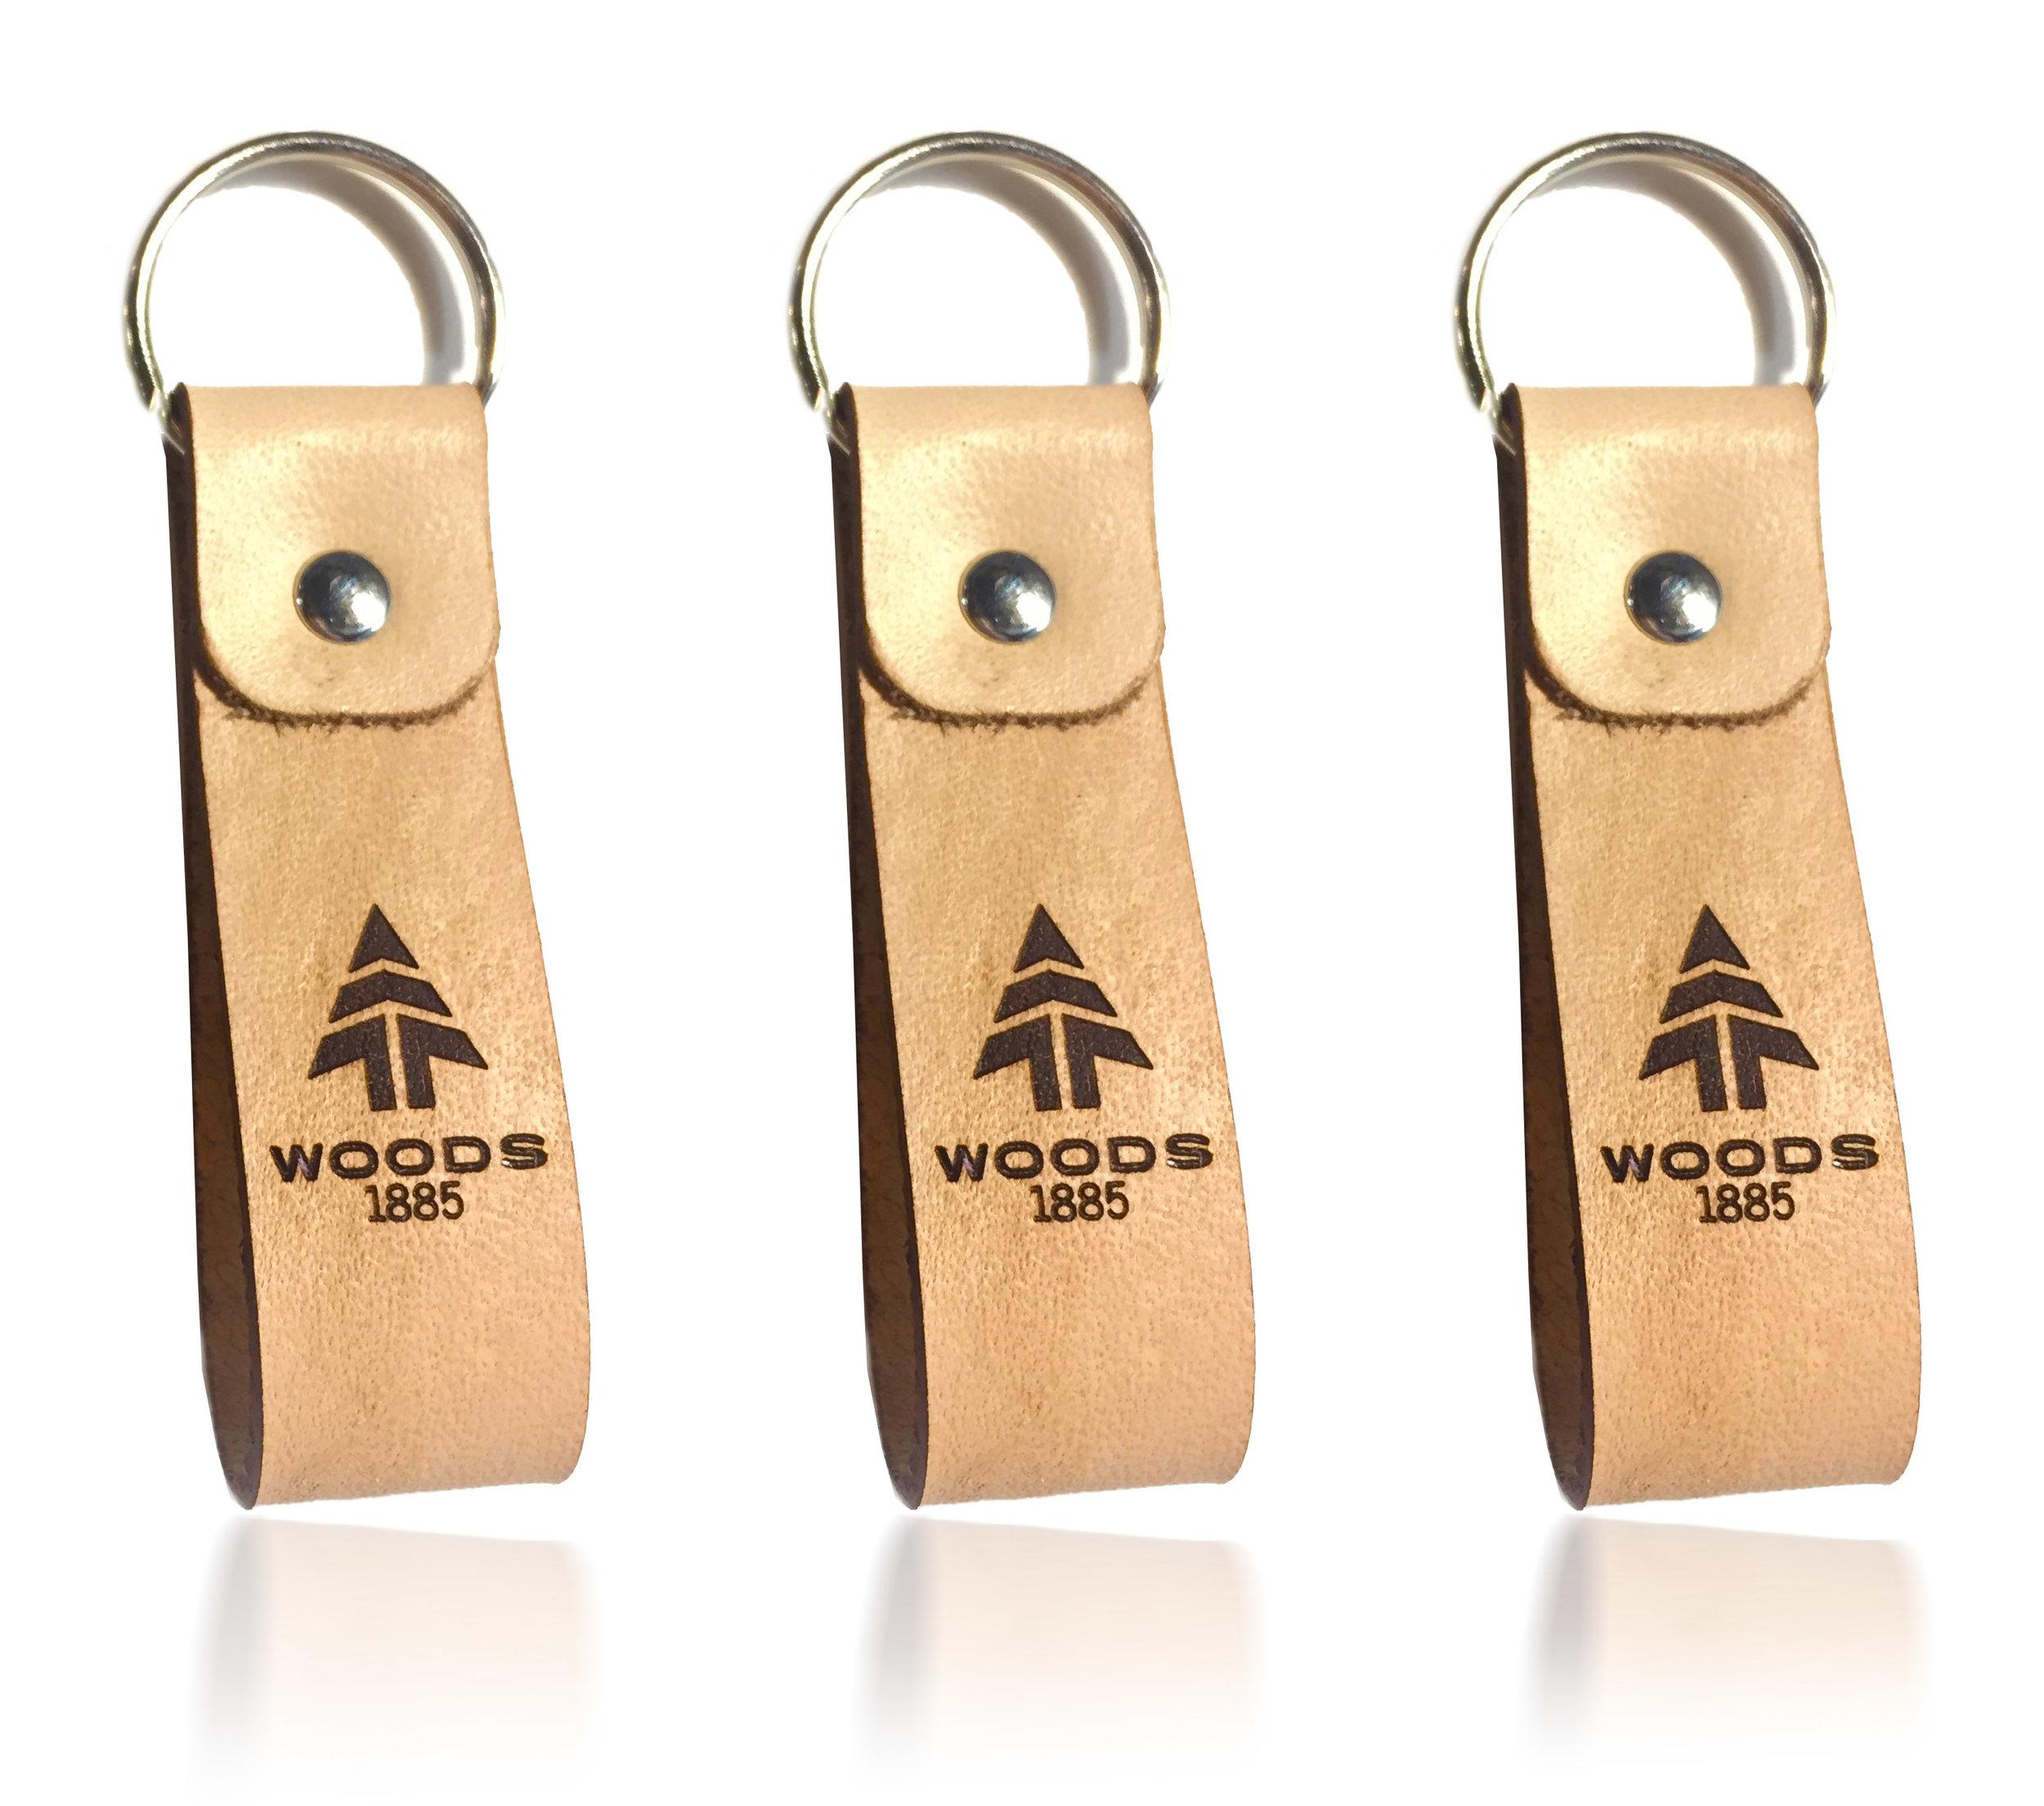 Woods KeyChain.jpg